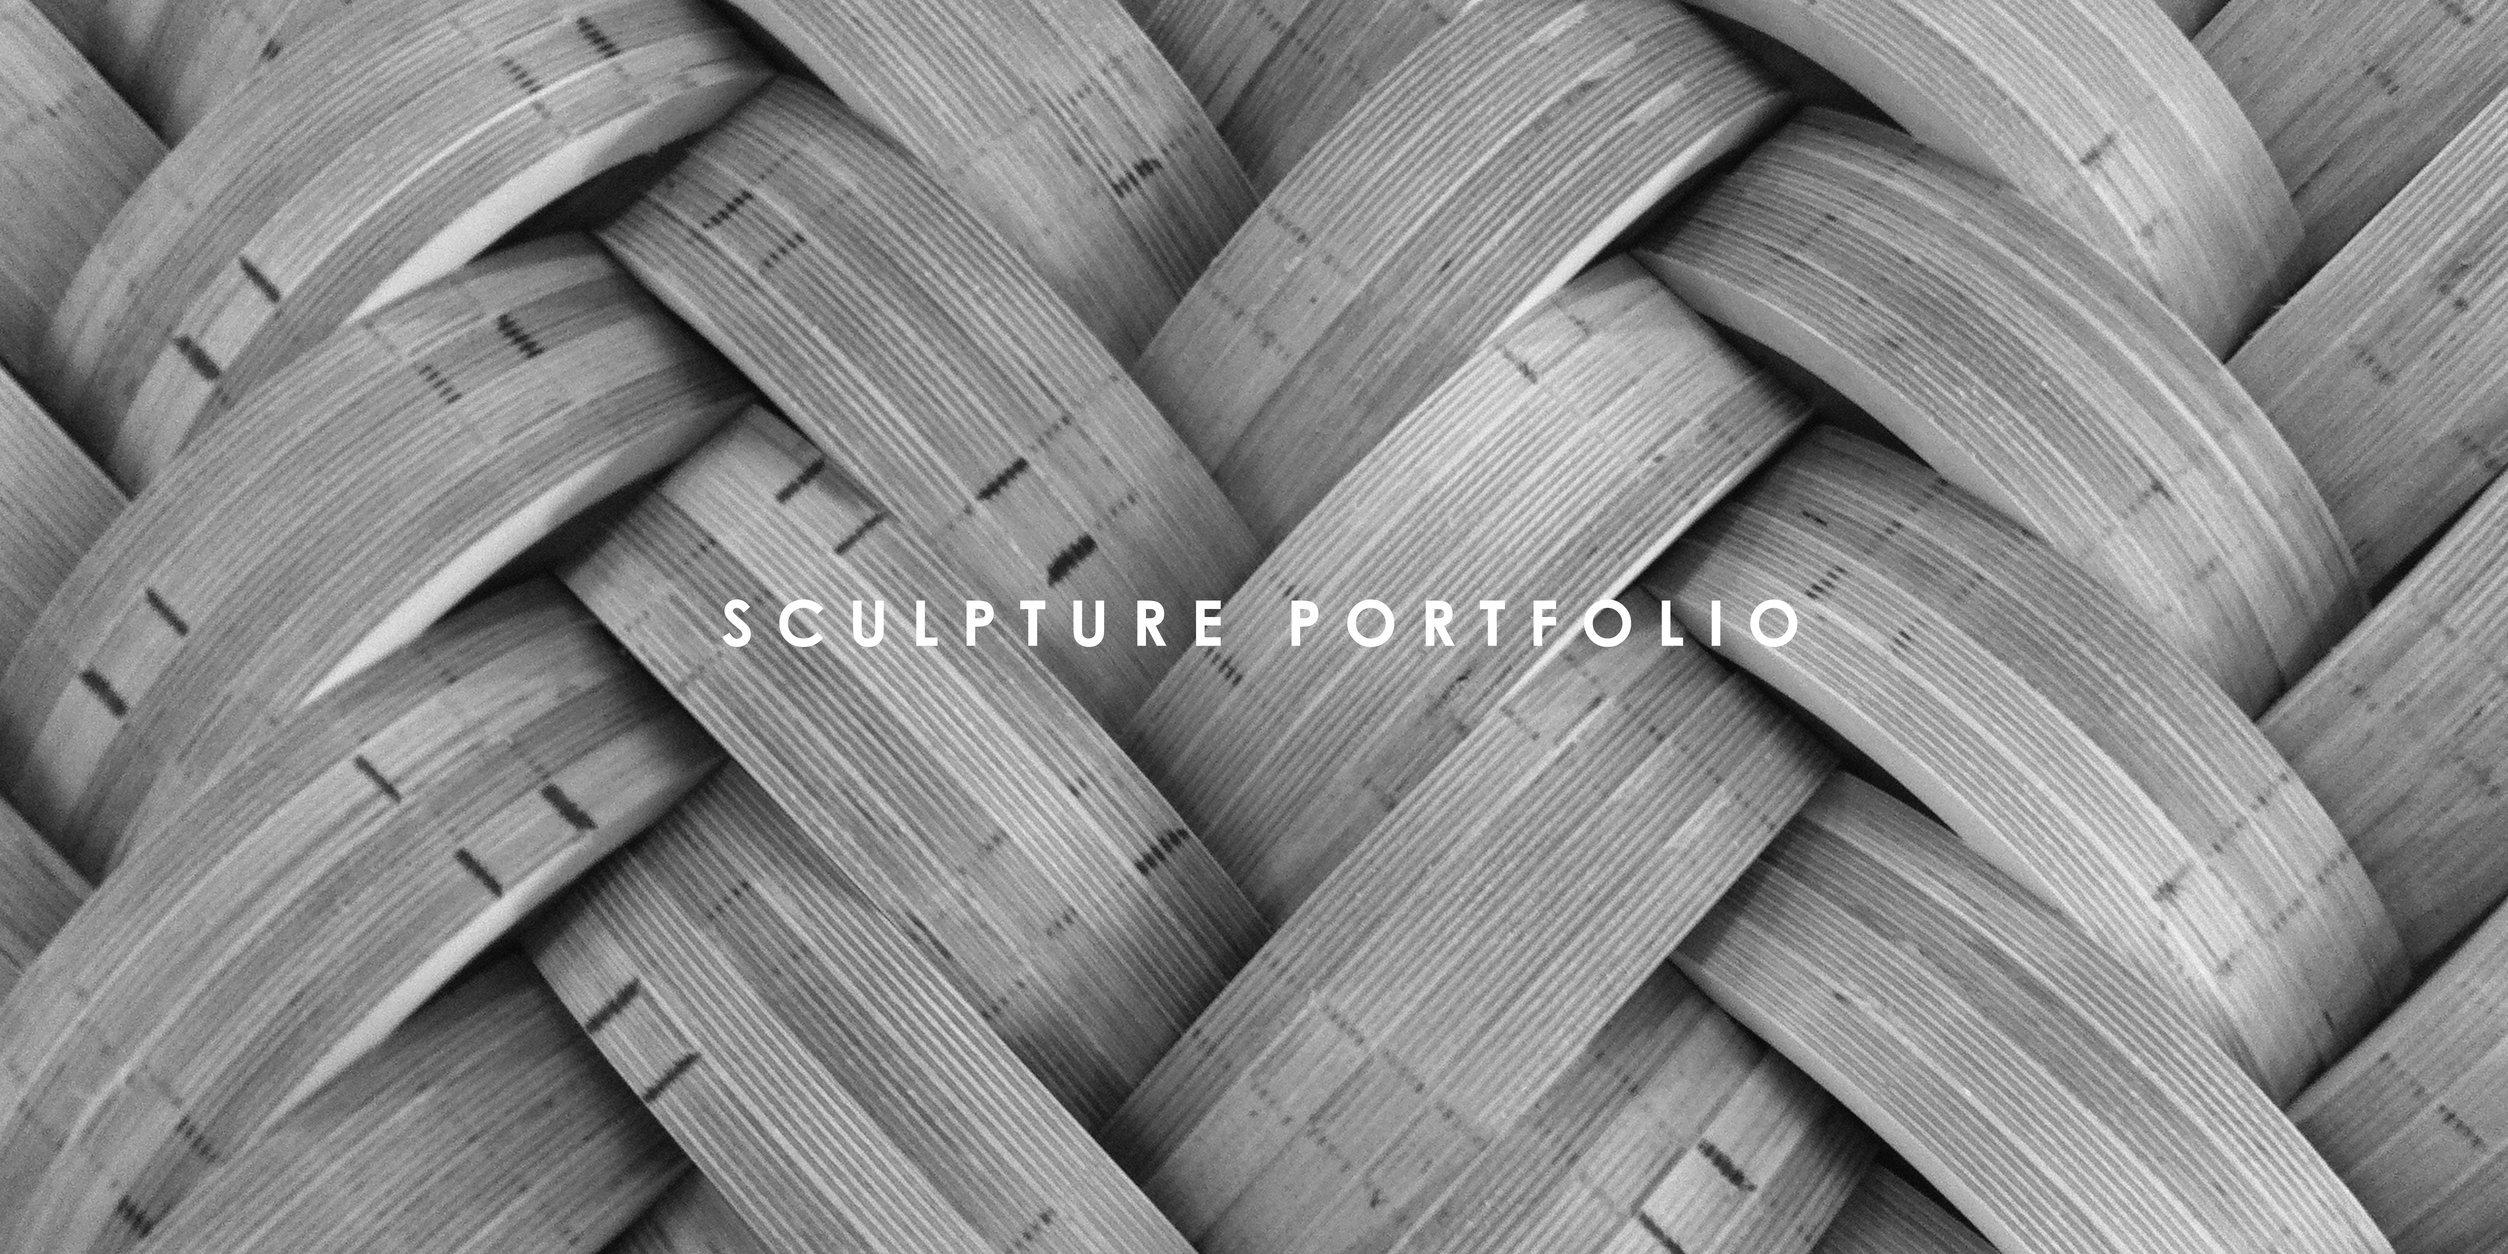 SCULPTURE PORTFOLIO.jpg